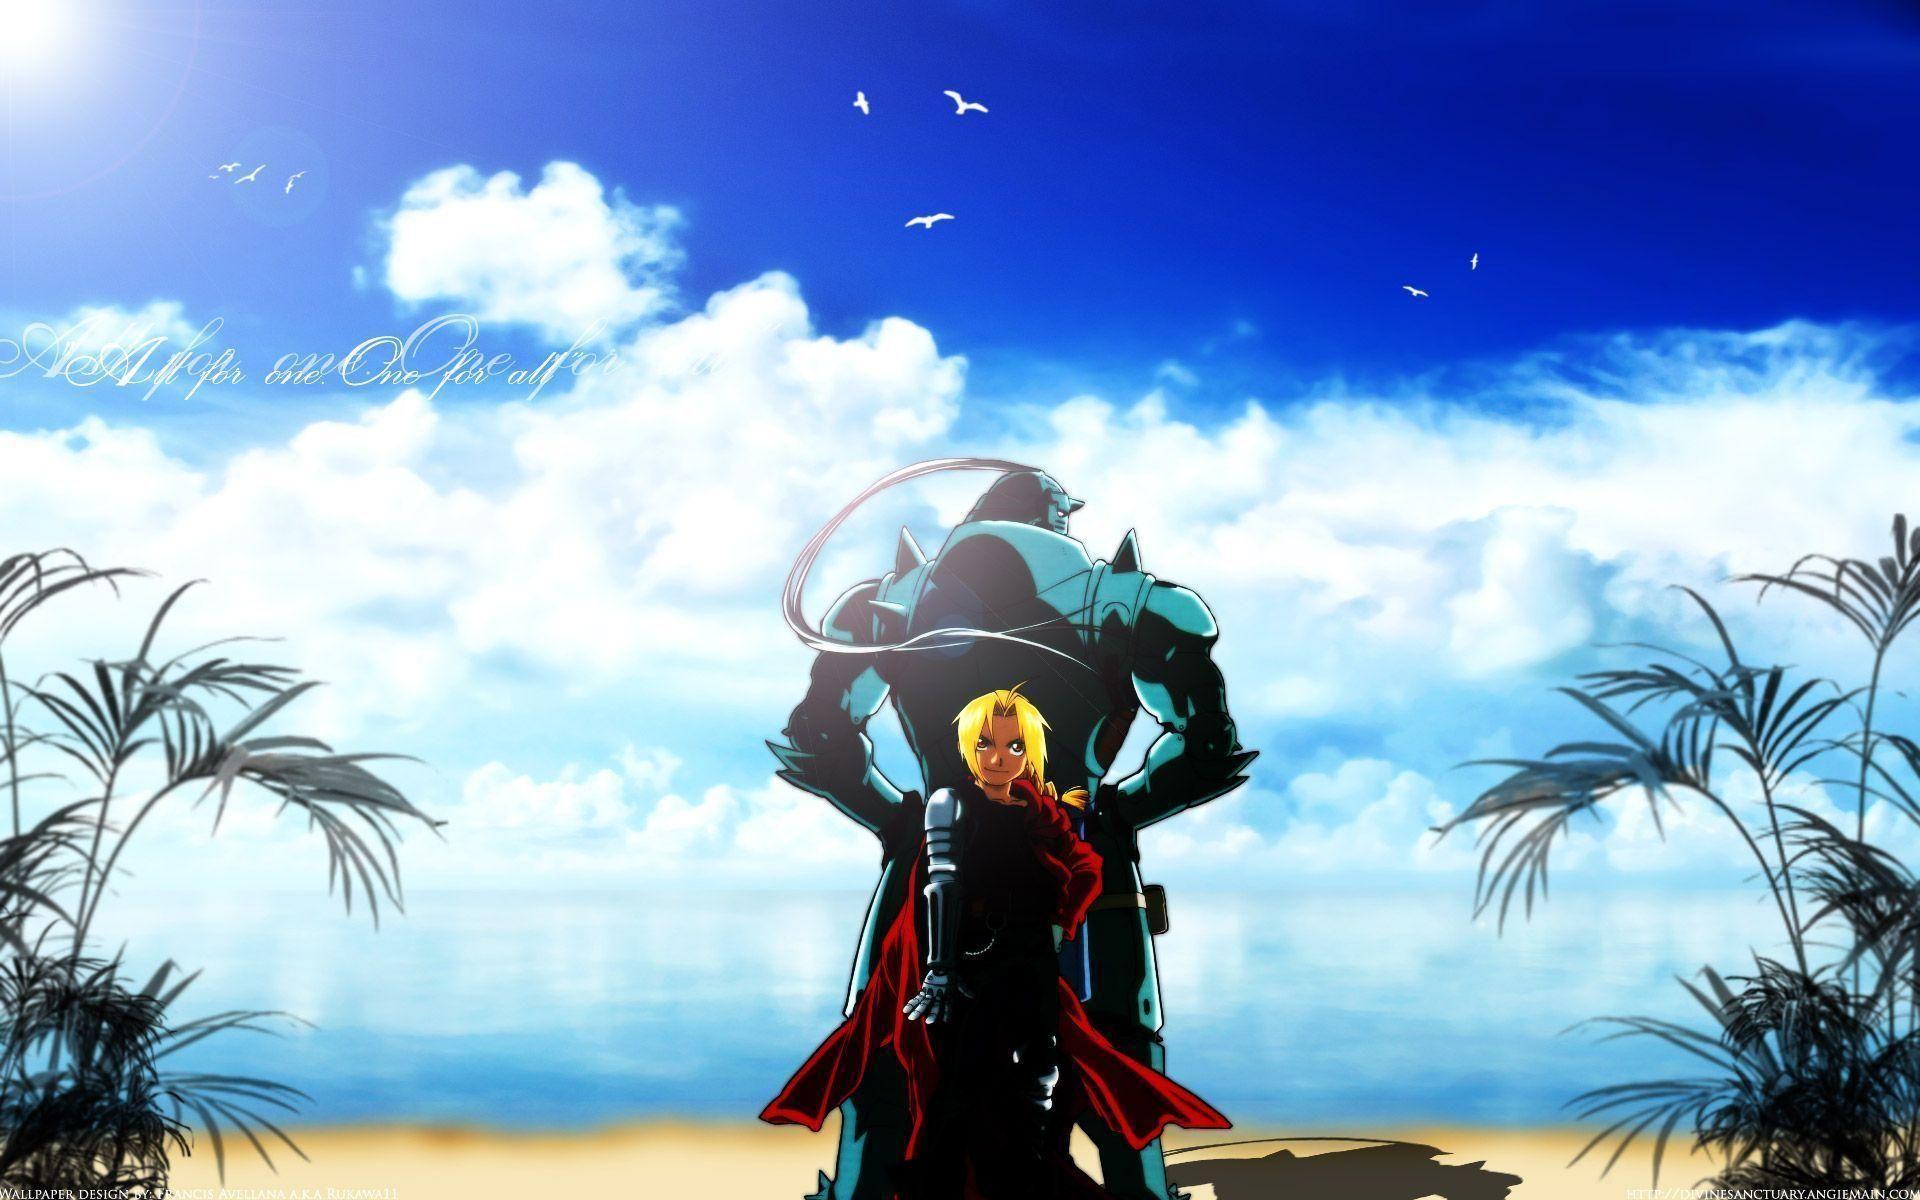 Pin Oleh King Di Fullmetal Alchemist Brotherhood Di 2020